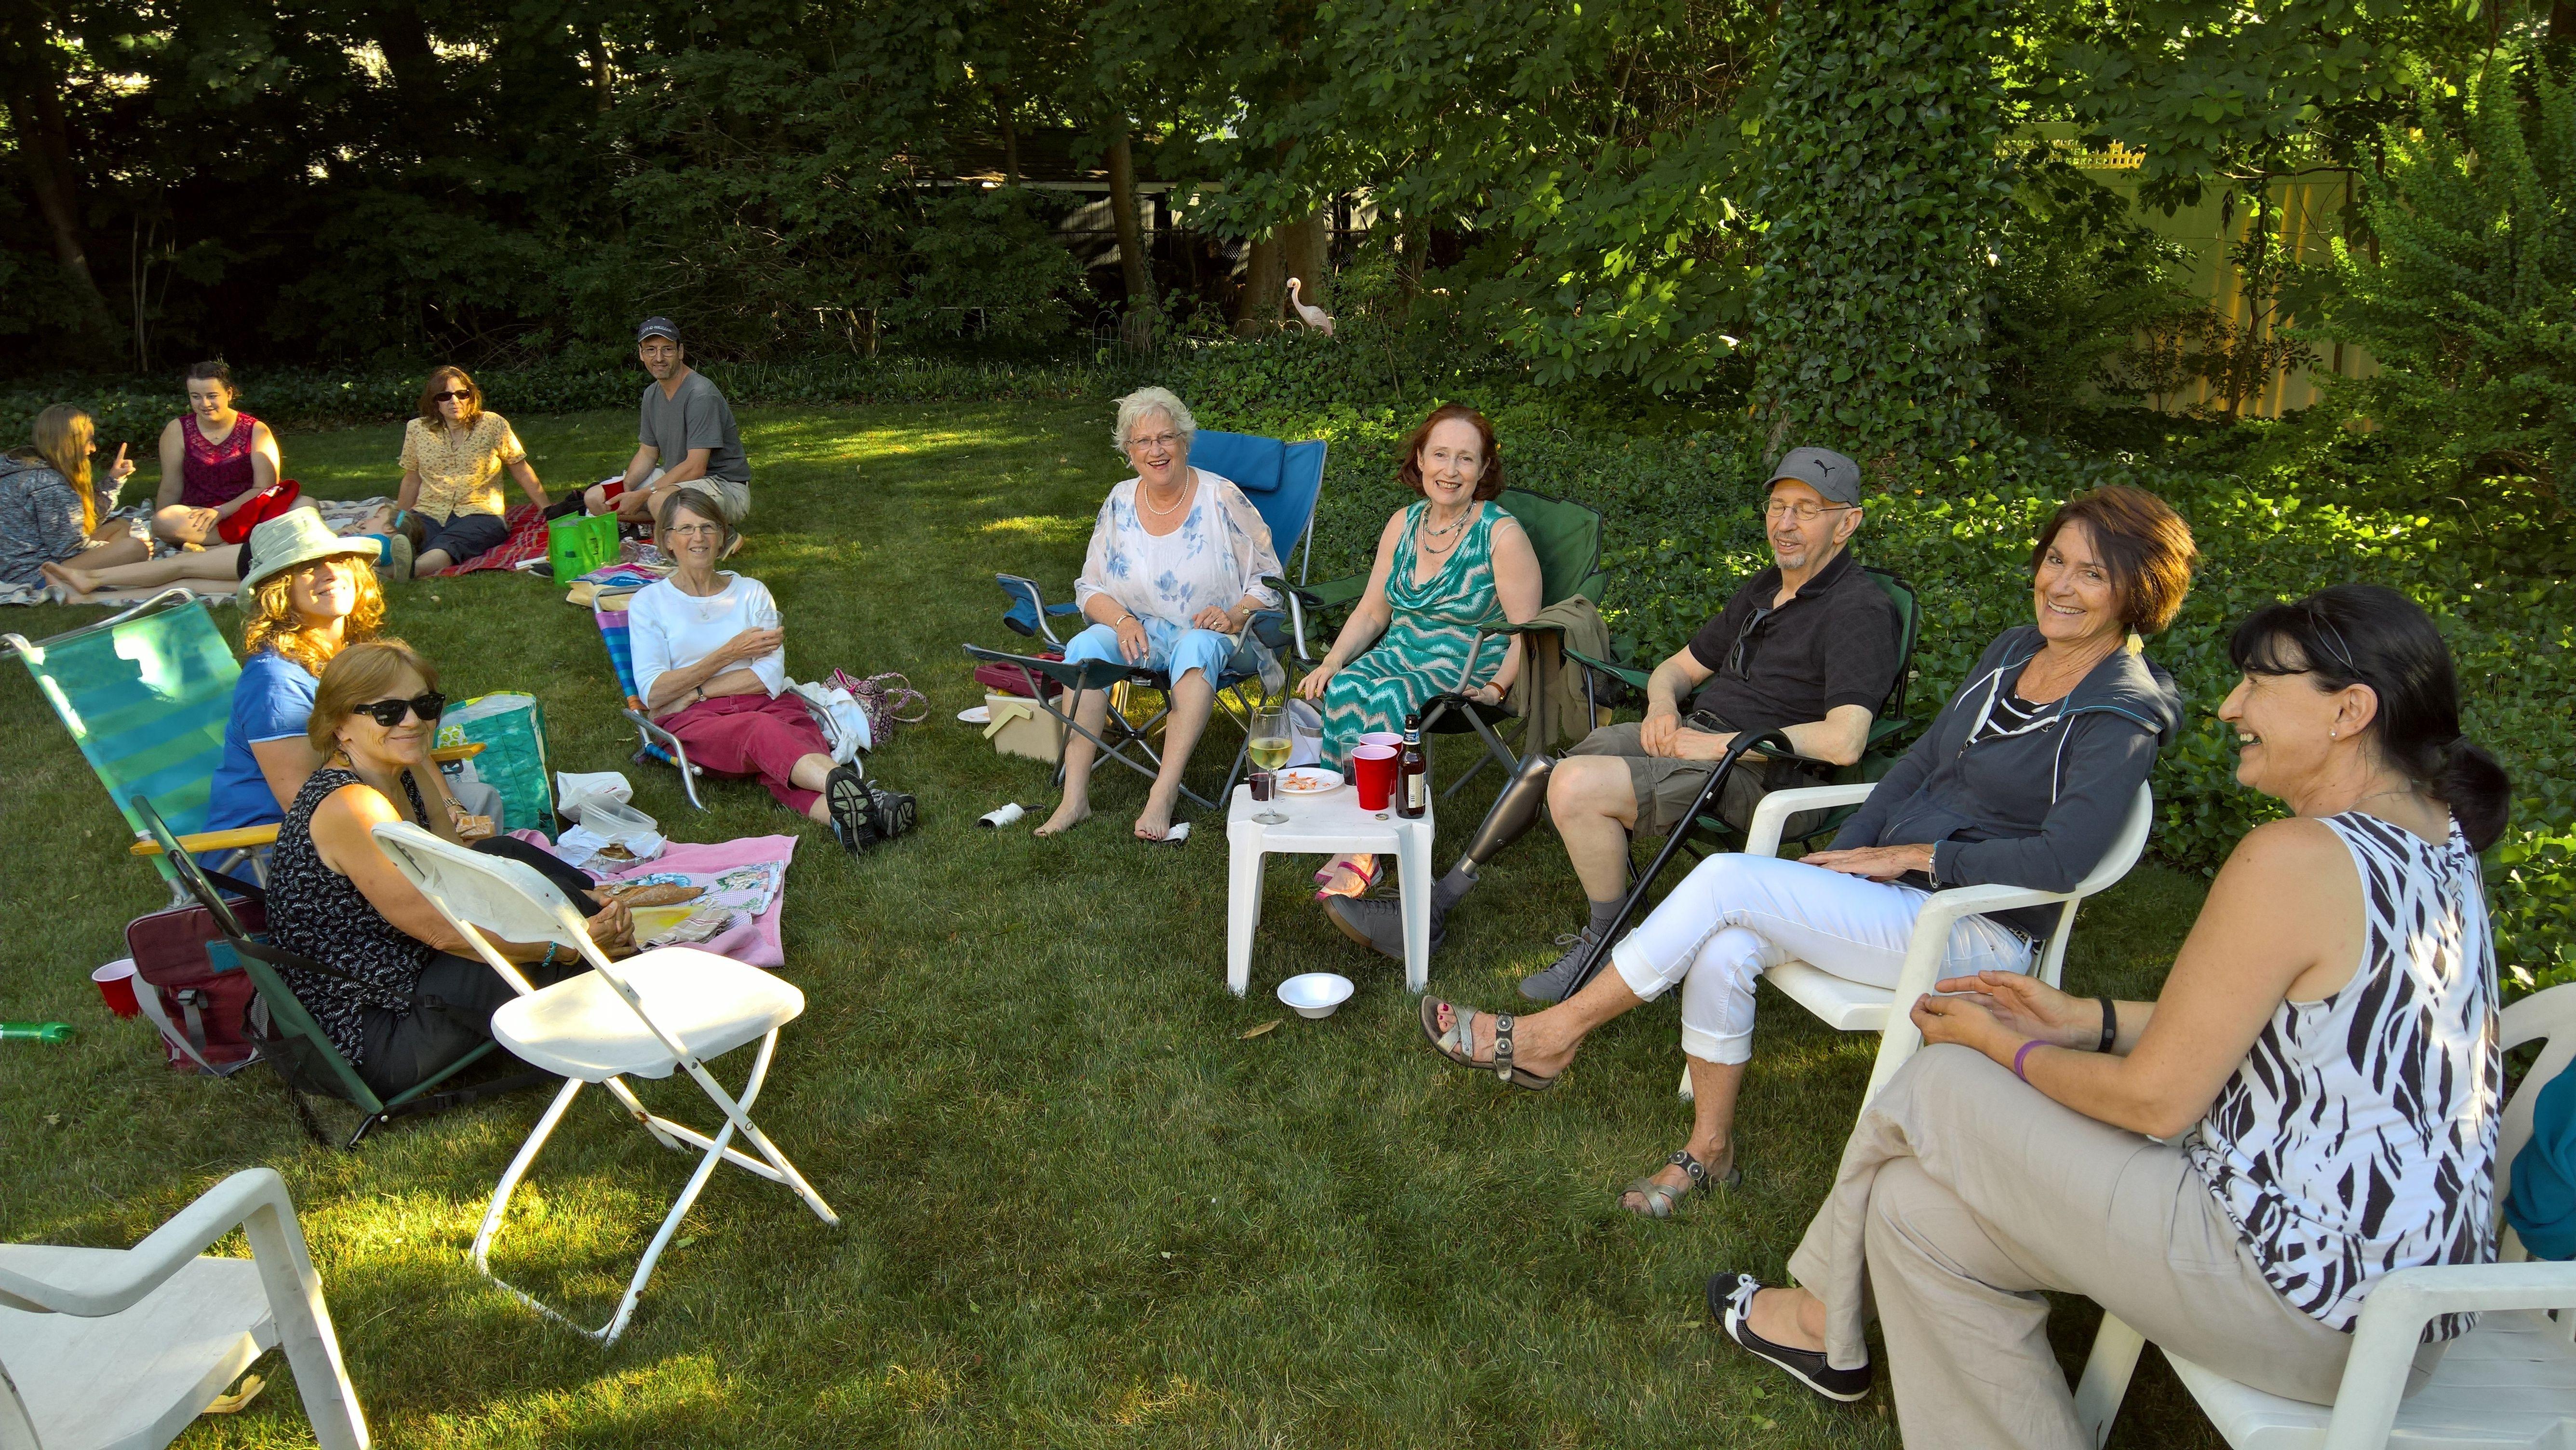 The Connecticut German Language Meetup Group